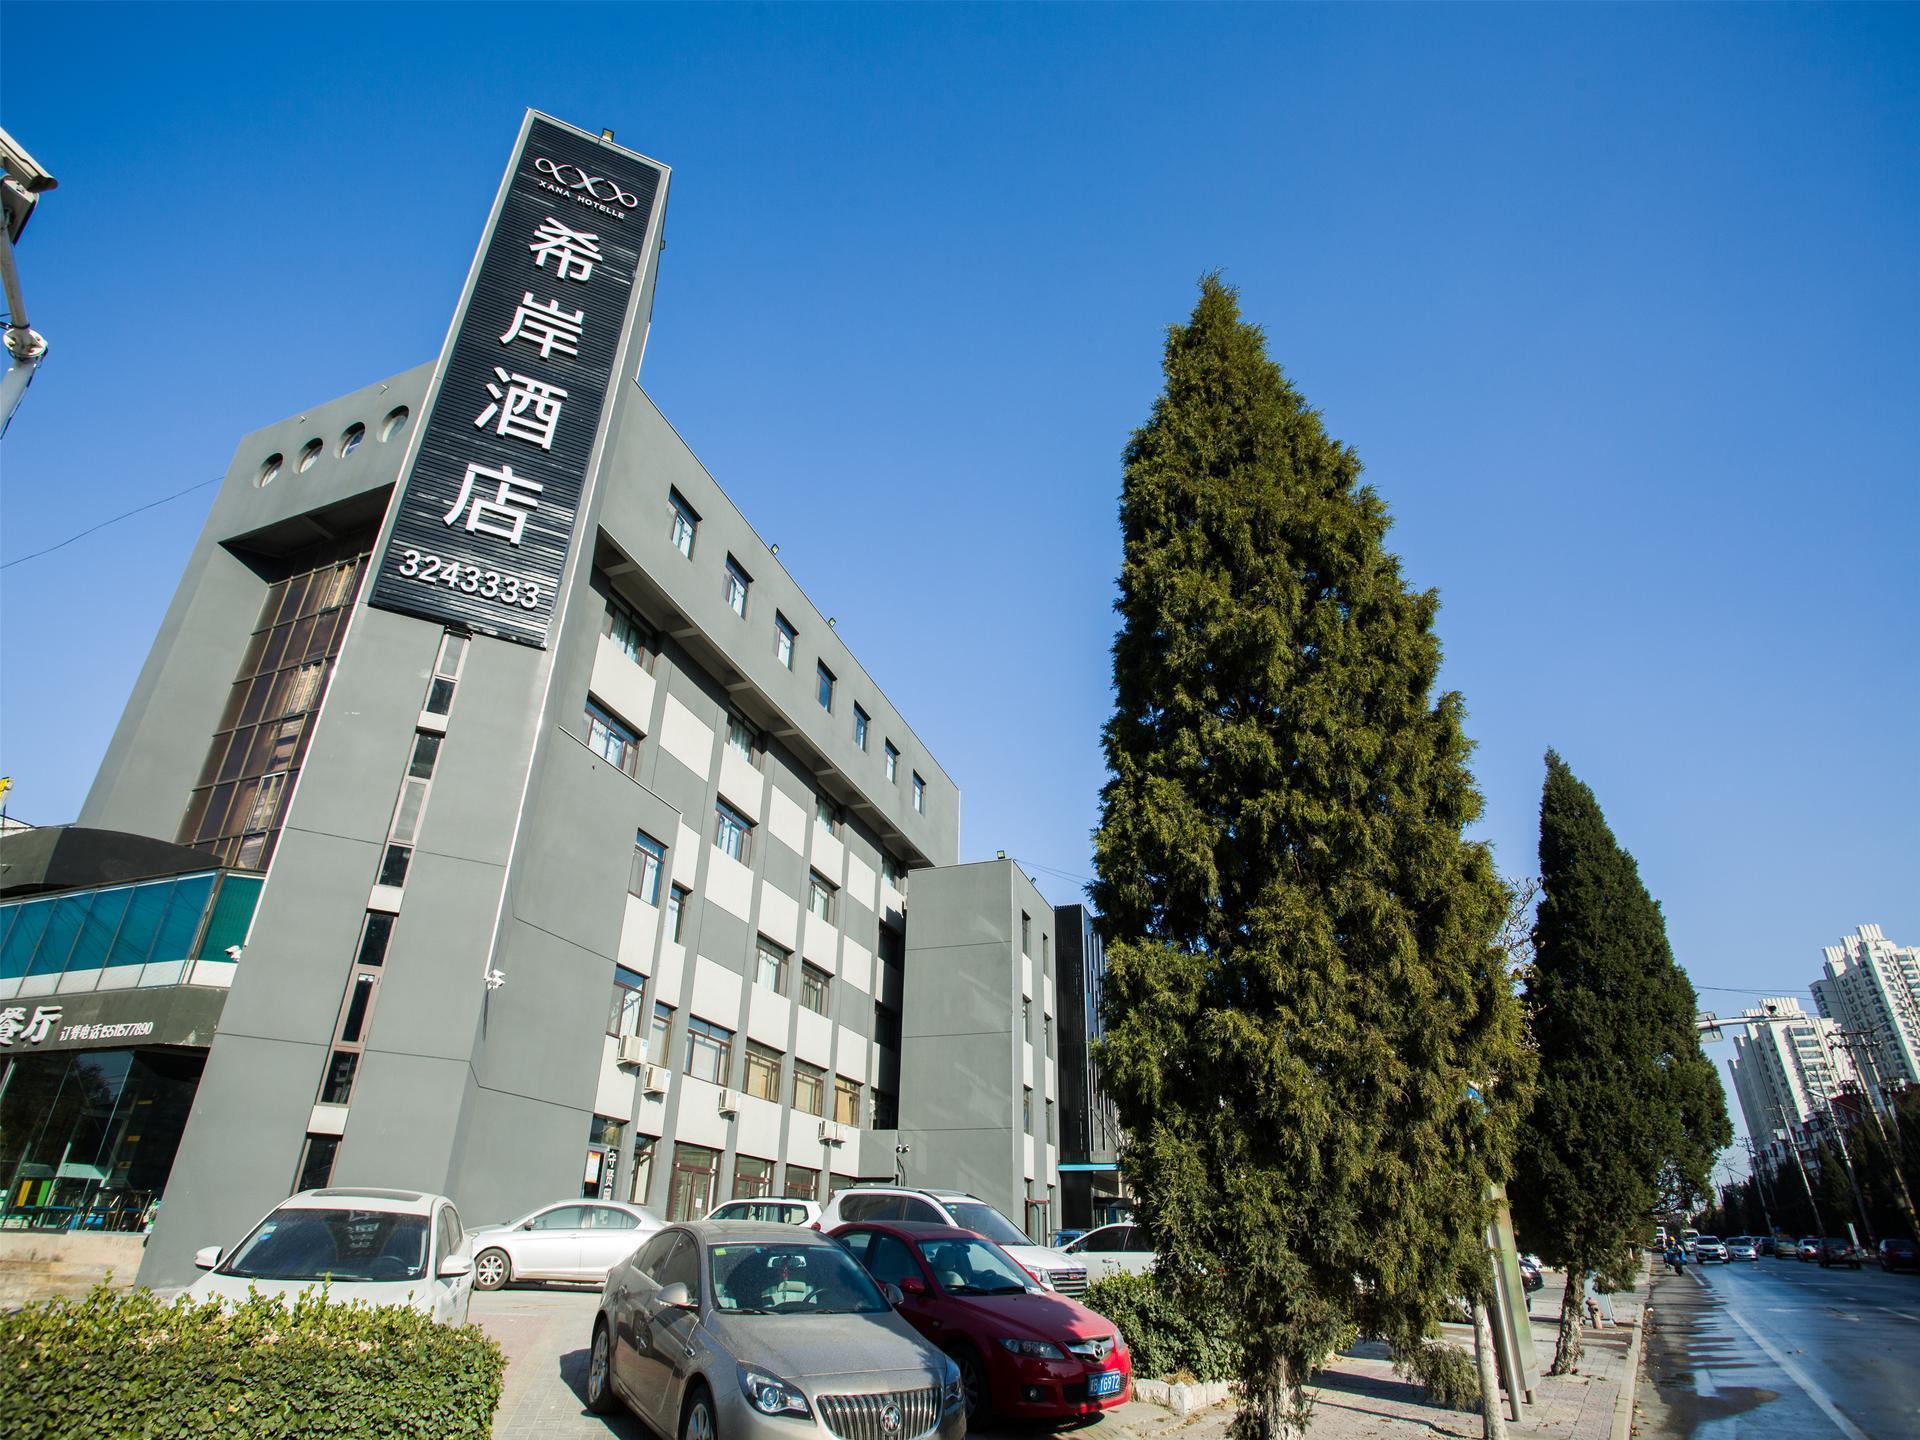 Xana Hotelle Tangshan North Railway Station